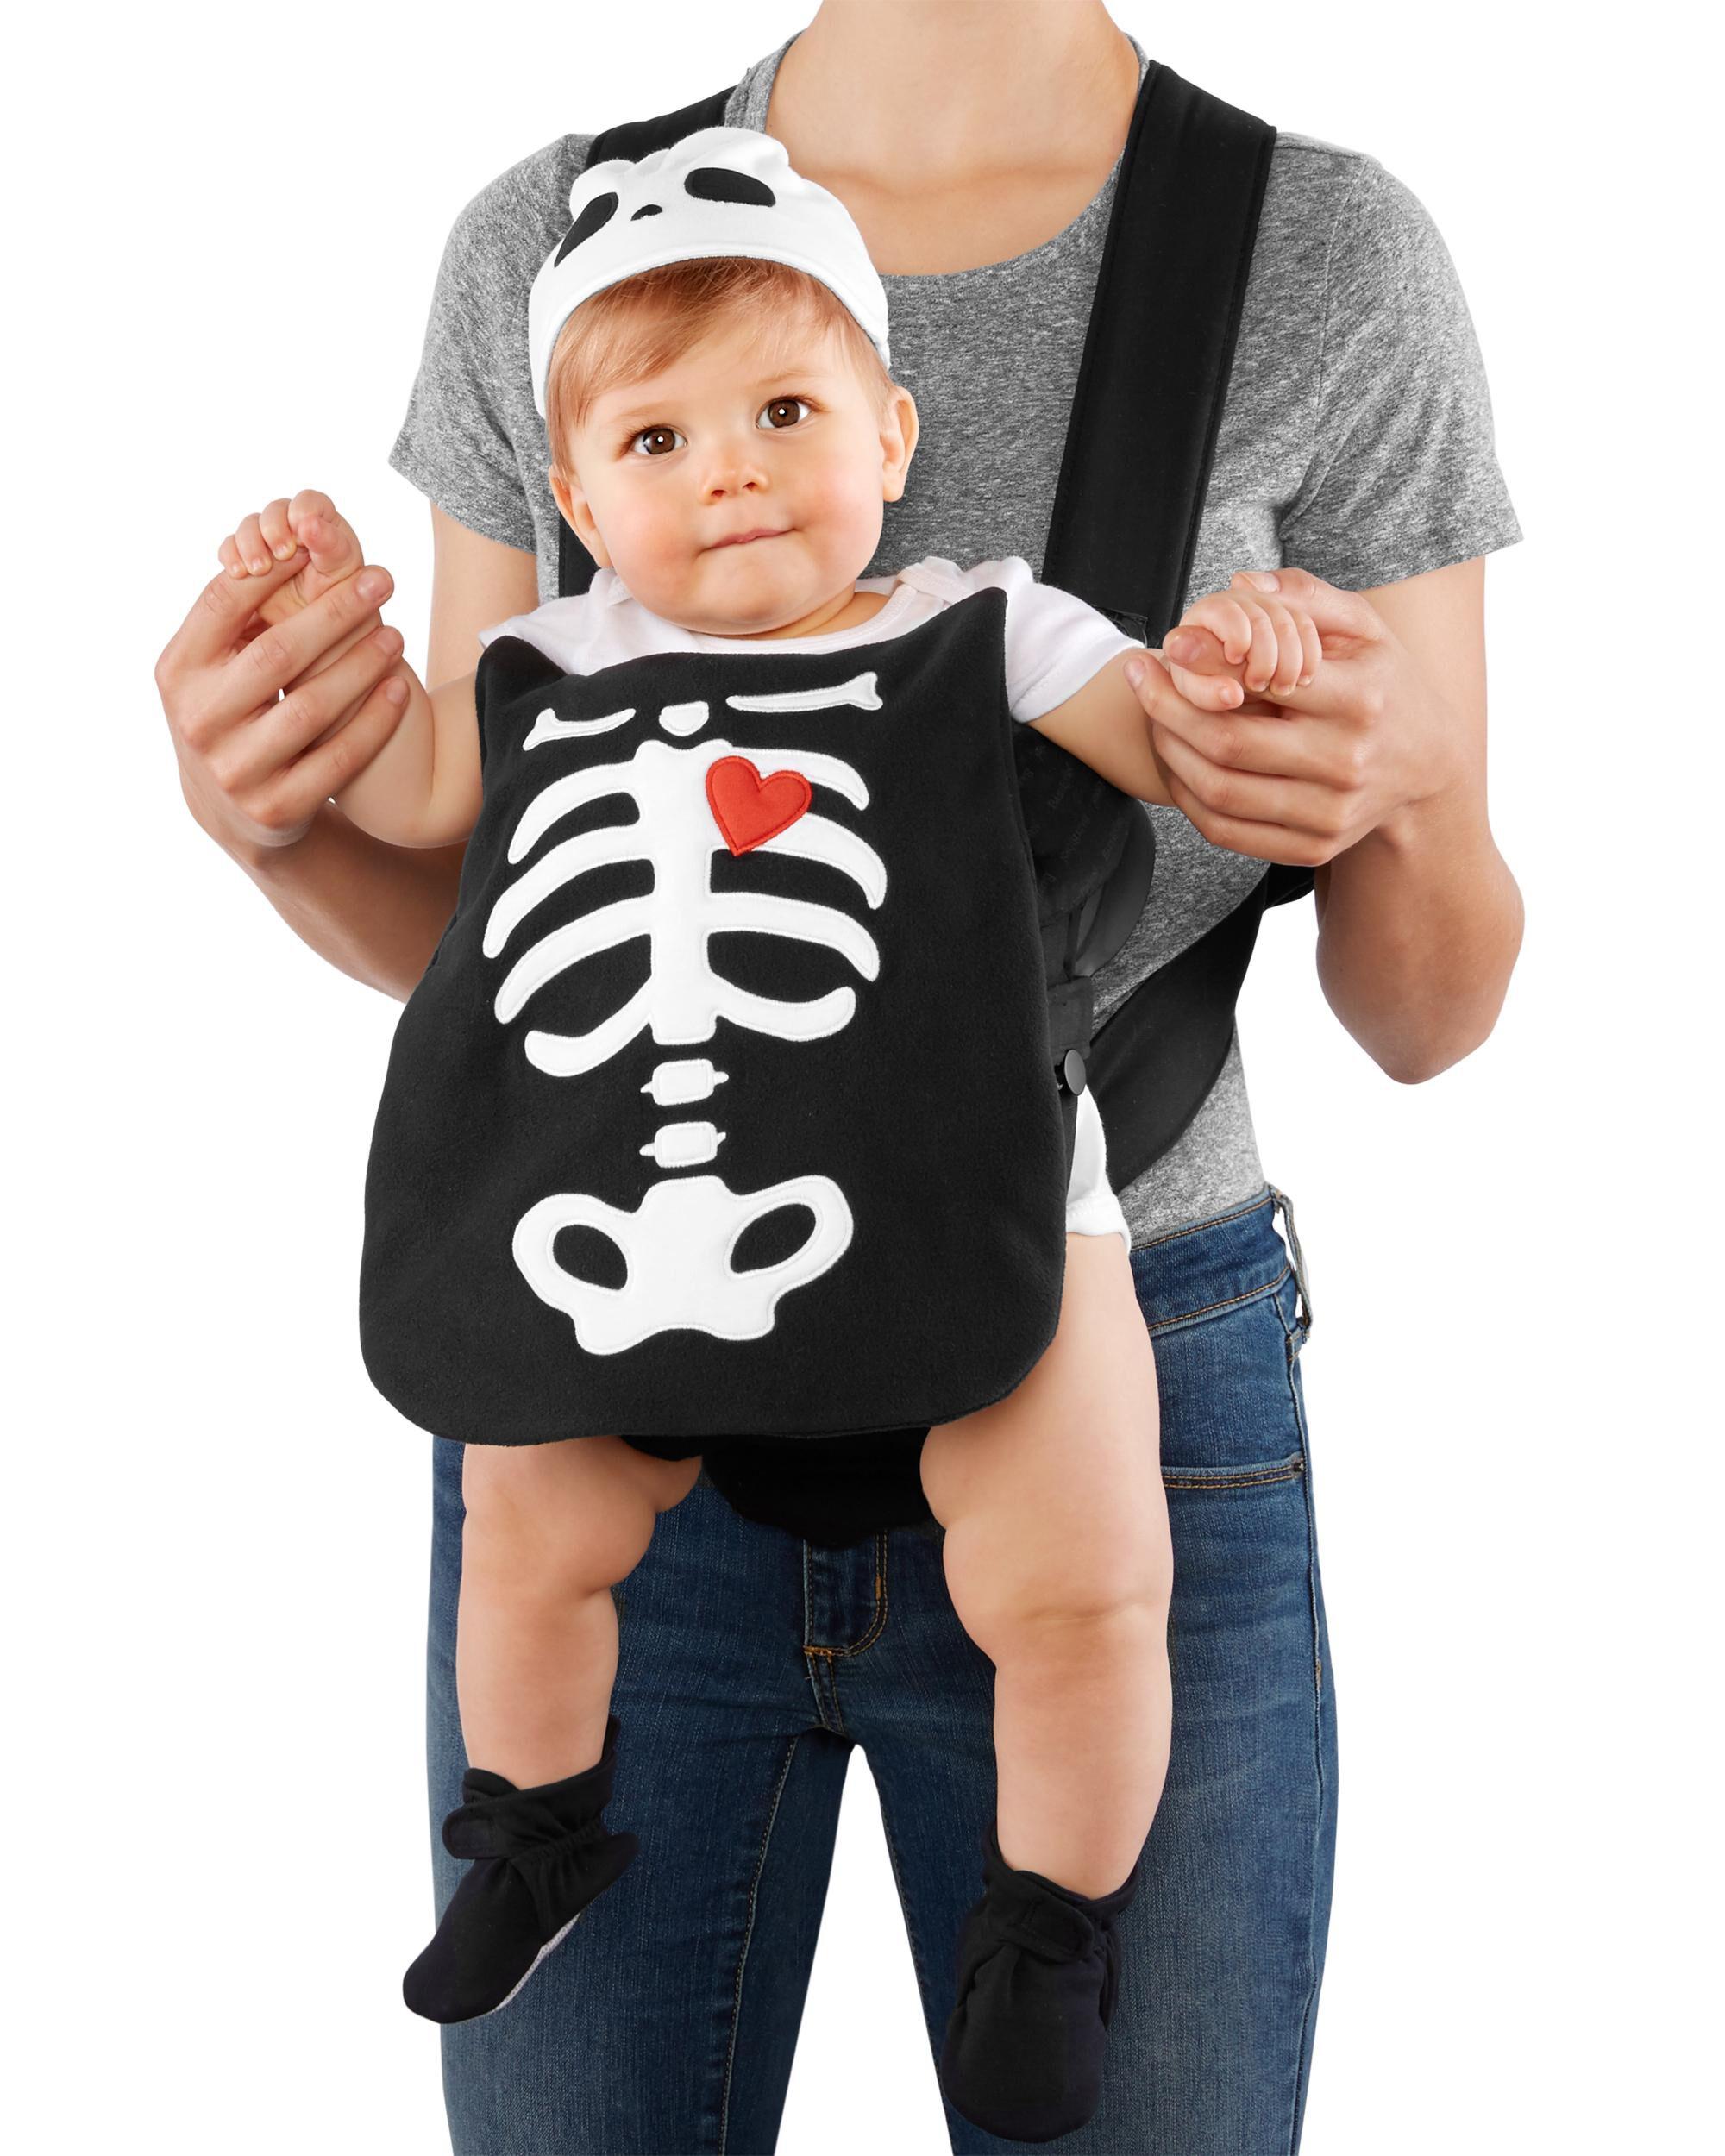 Little Skeleton Halloween Carrier Costume  sc 1 st  Carteru0027s & Baby Boy Halloween Shop | Costumes | Carteru0027s